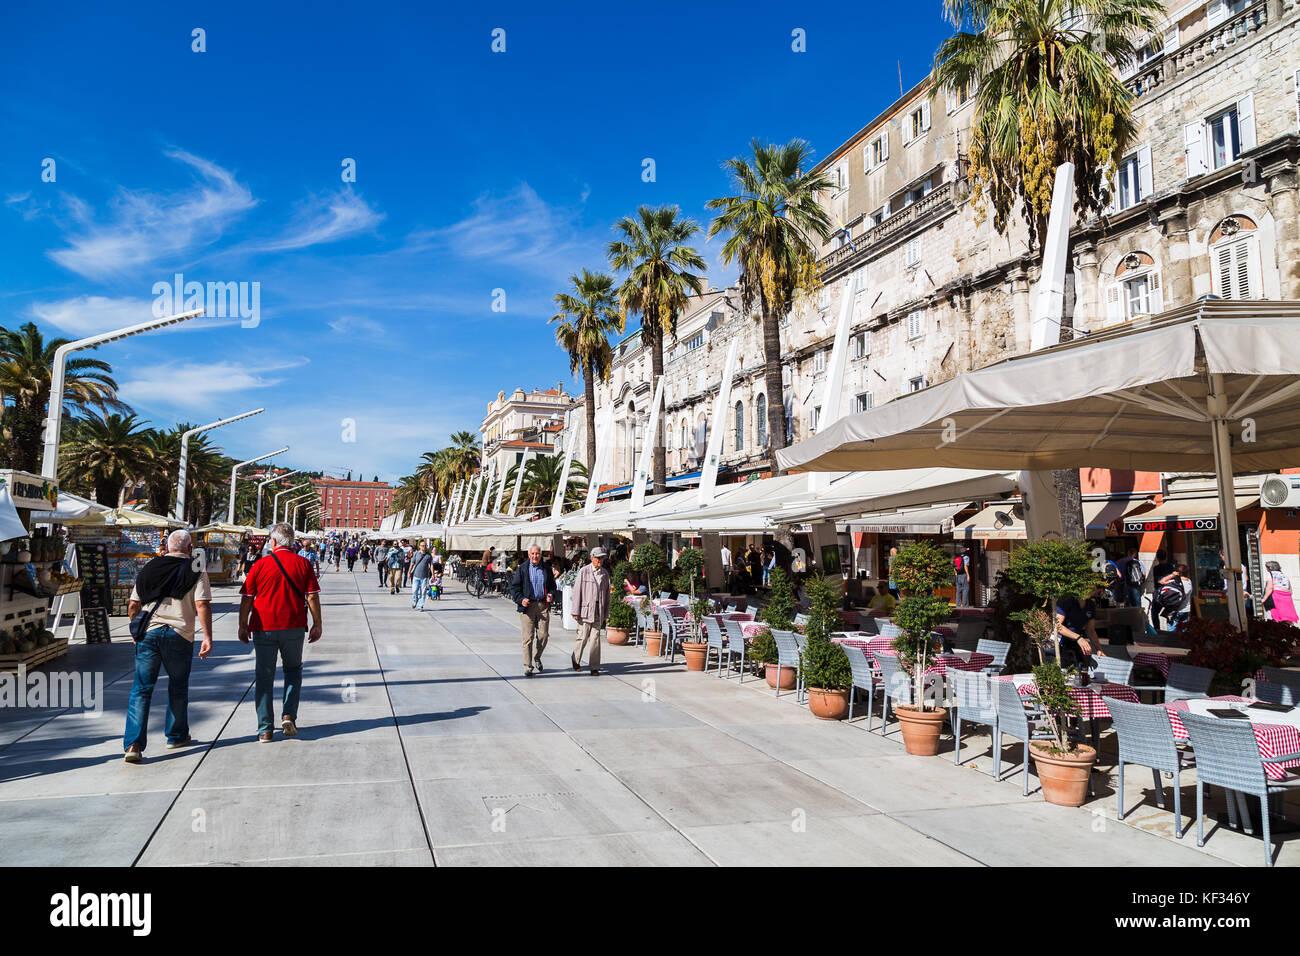 Cafe Riva Waterfront Split Croatia Stock Photos & Cafe ...